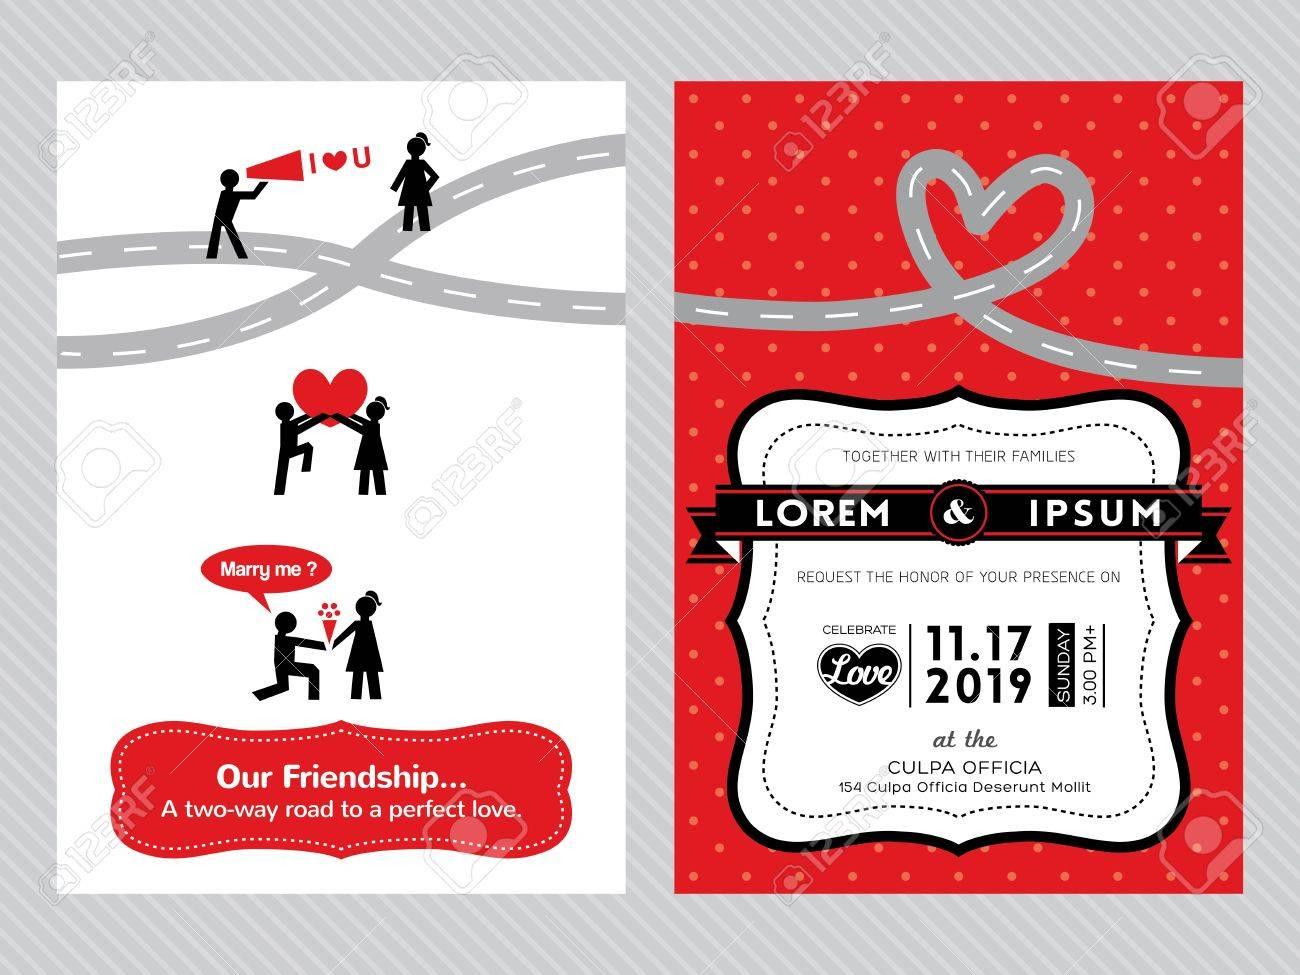 Wedding Invitation Card Template With Cute Groom And Bride Cartoon ...